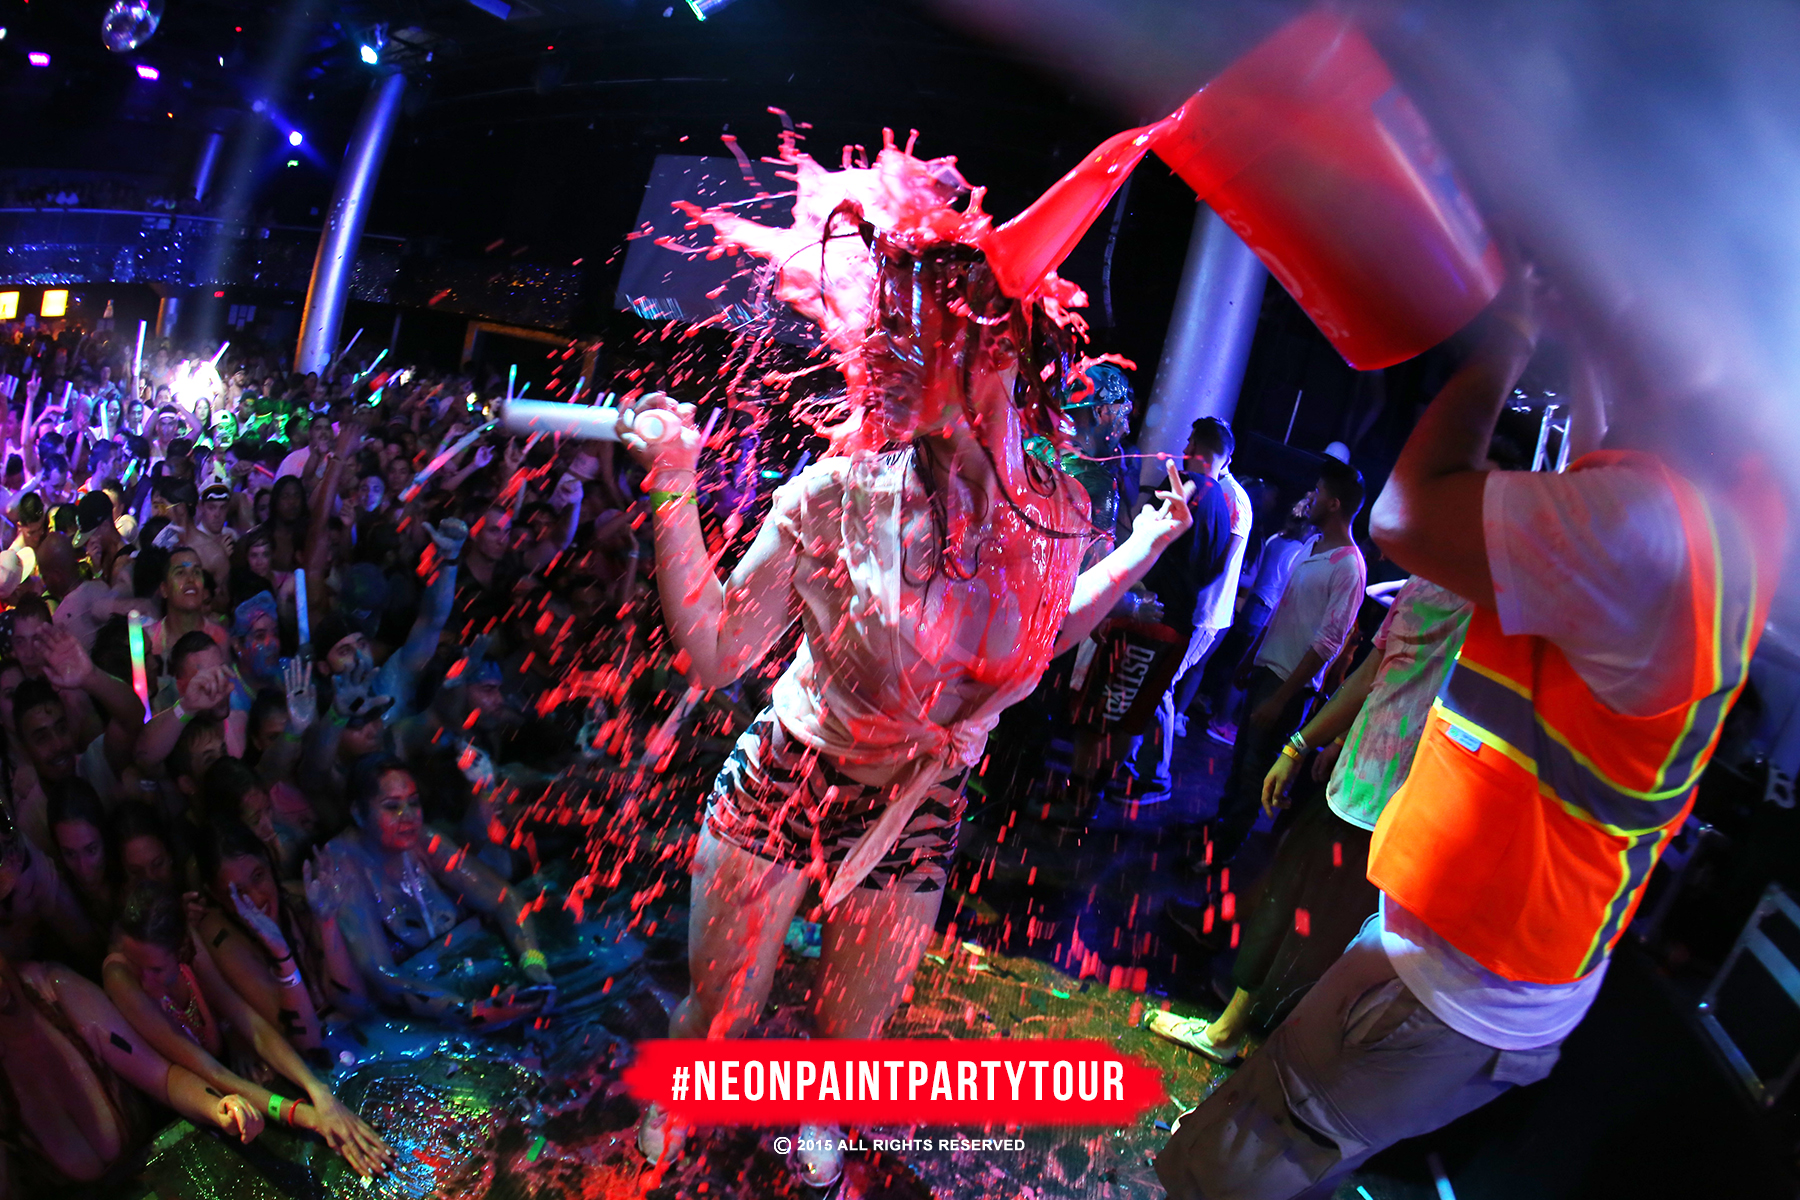 The Neon Paint Party Tour Blood Bath Tickets 10/15/15